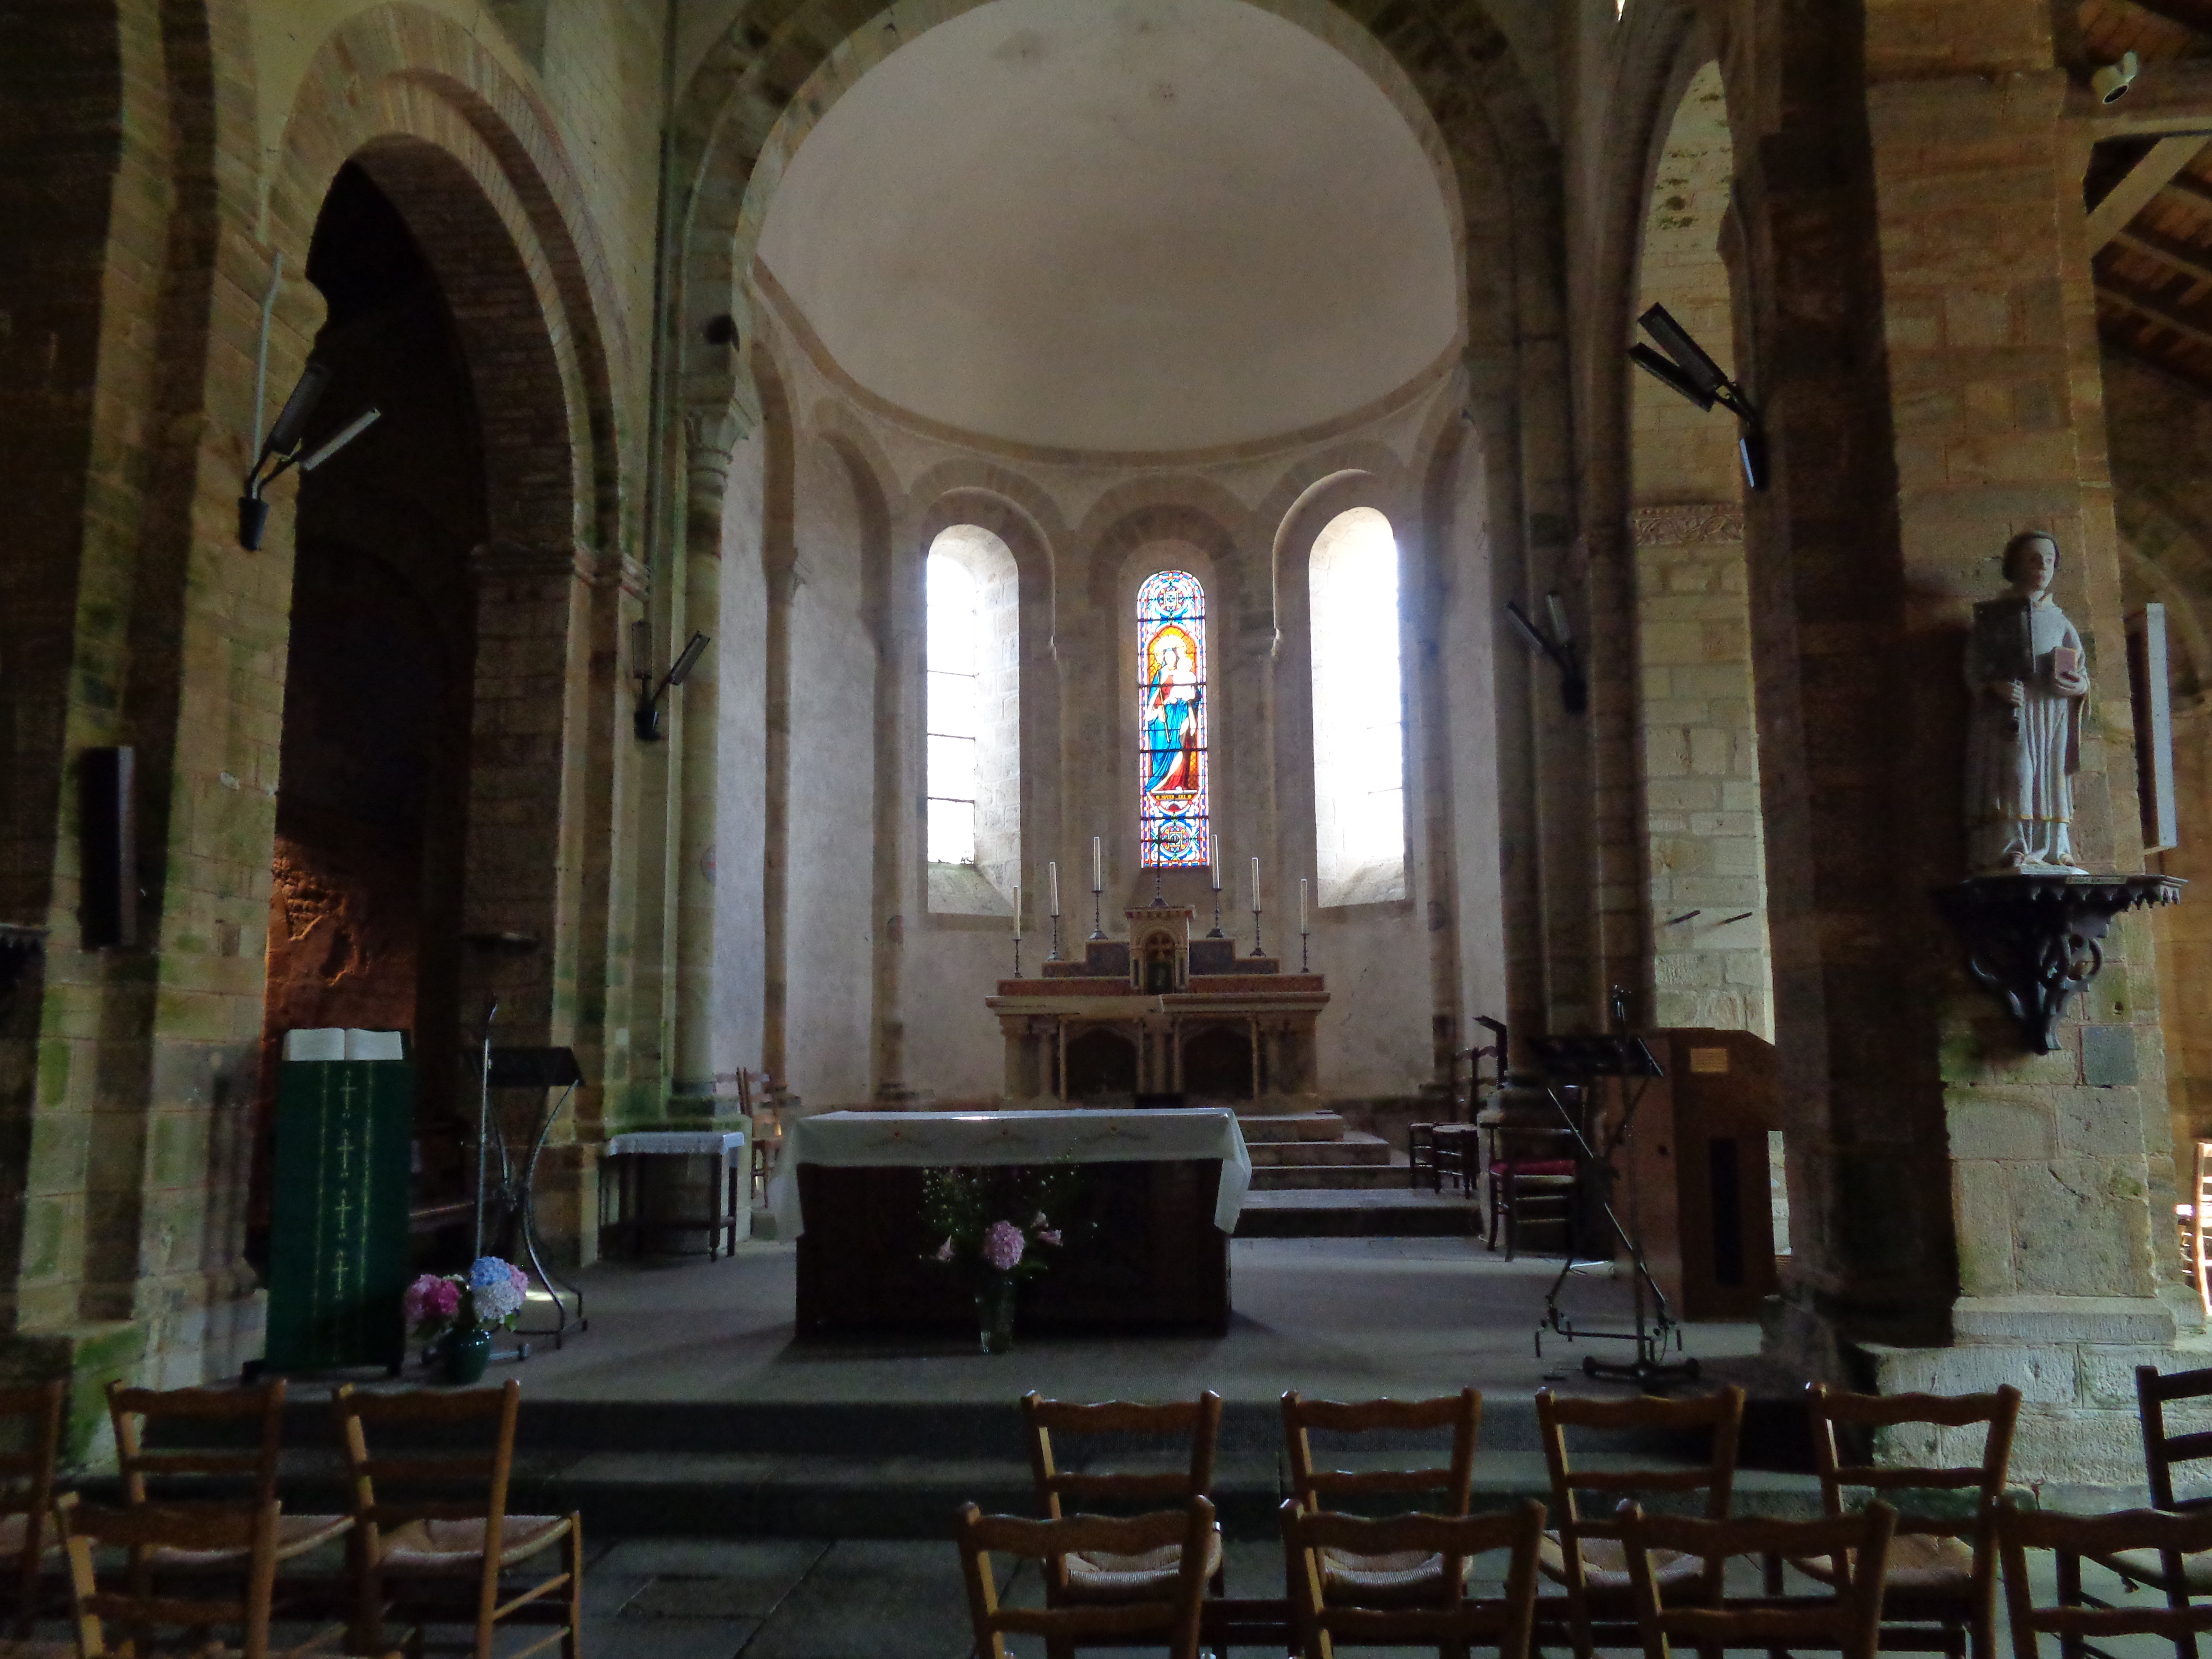 Daoulas abbaye ch ND altar sep21